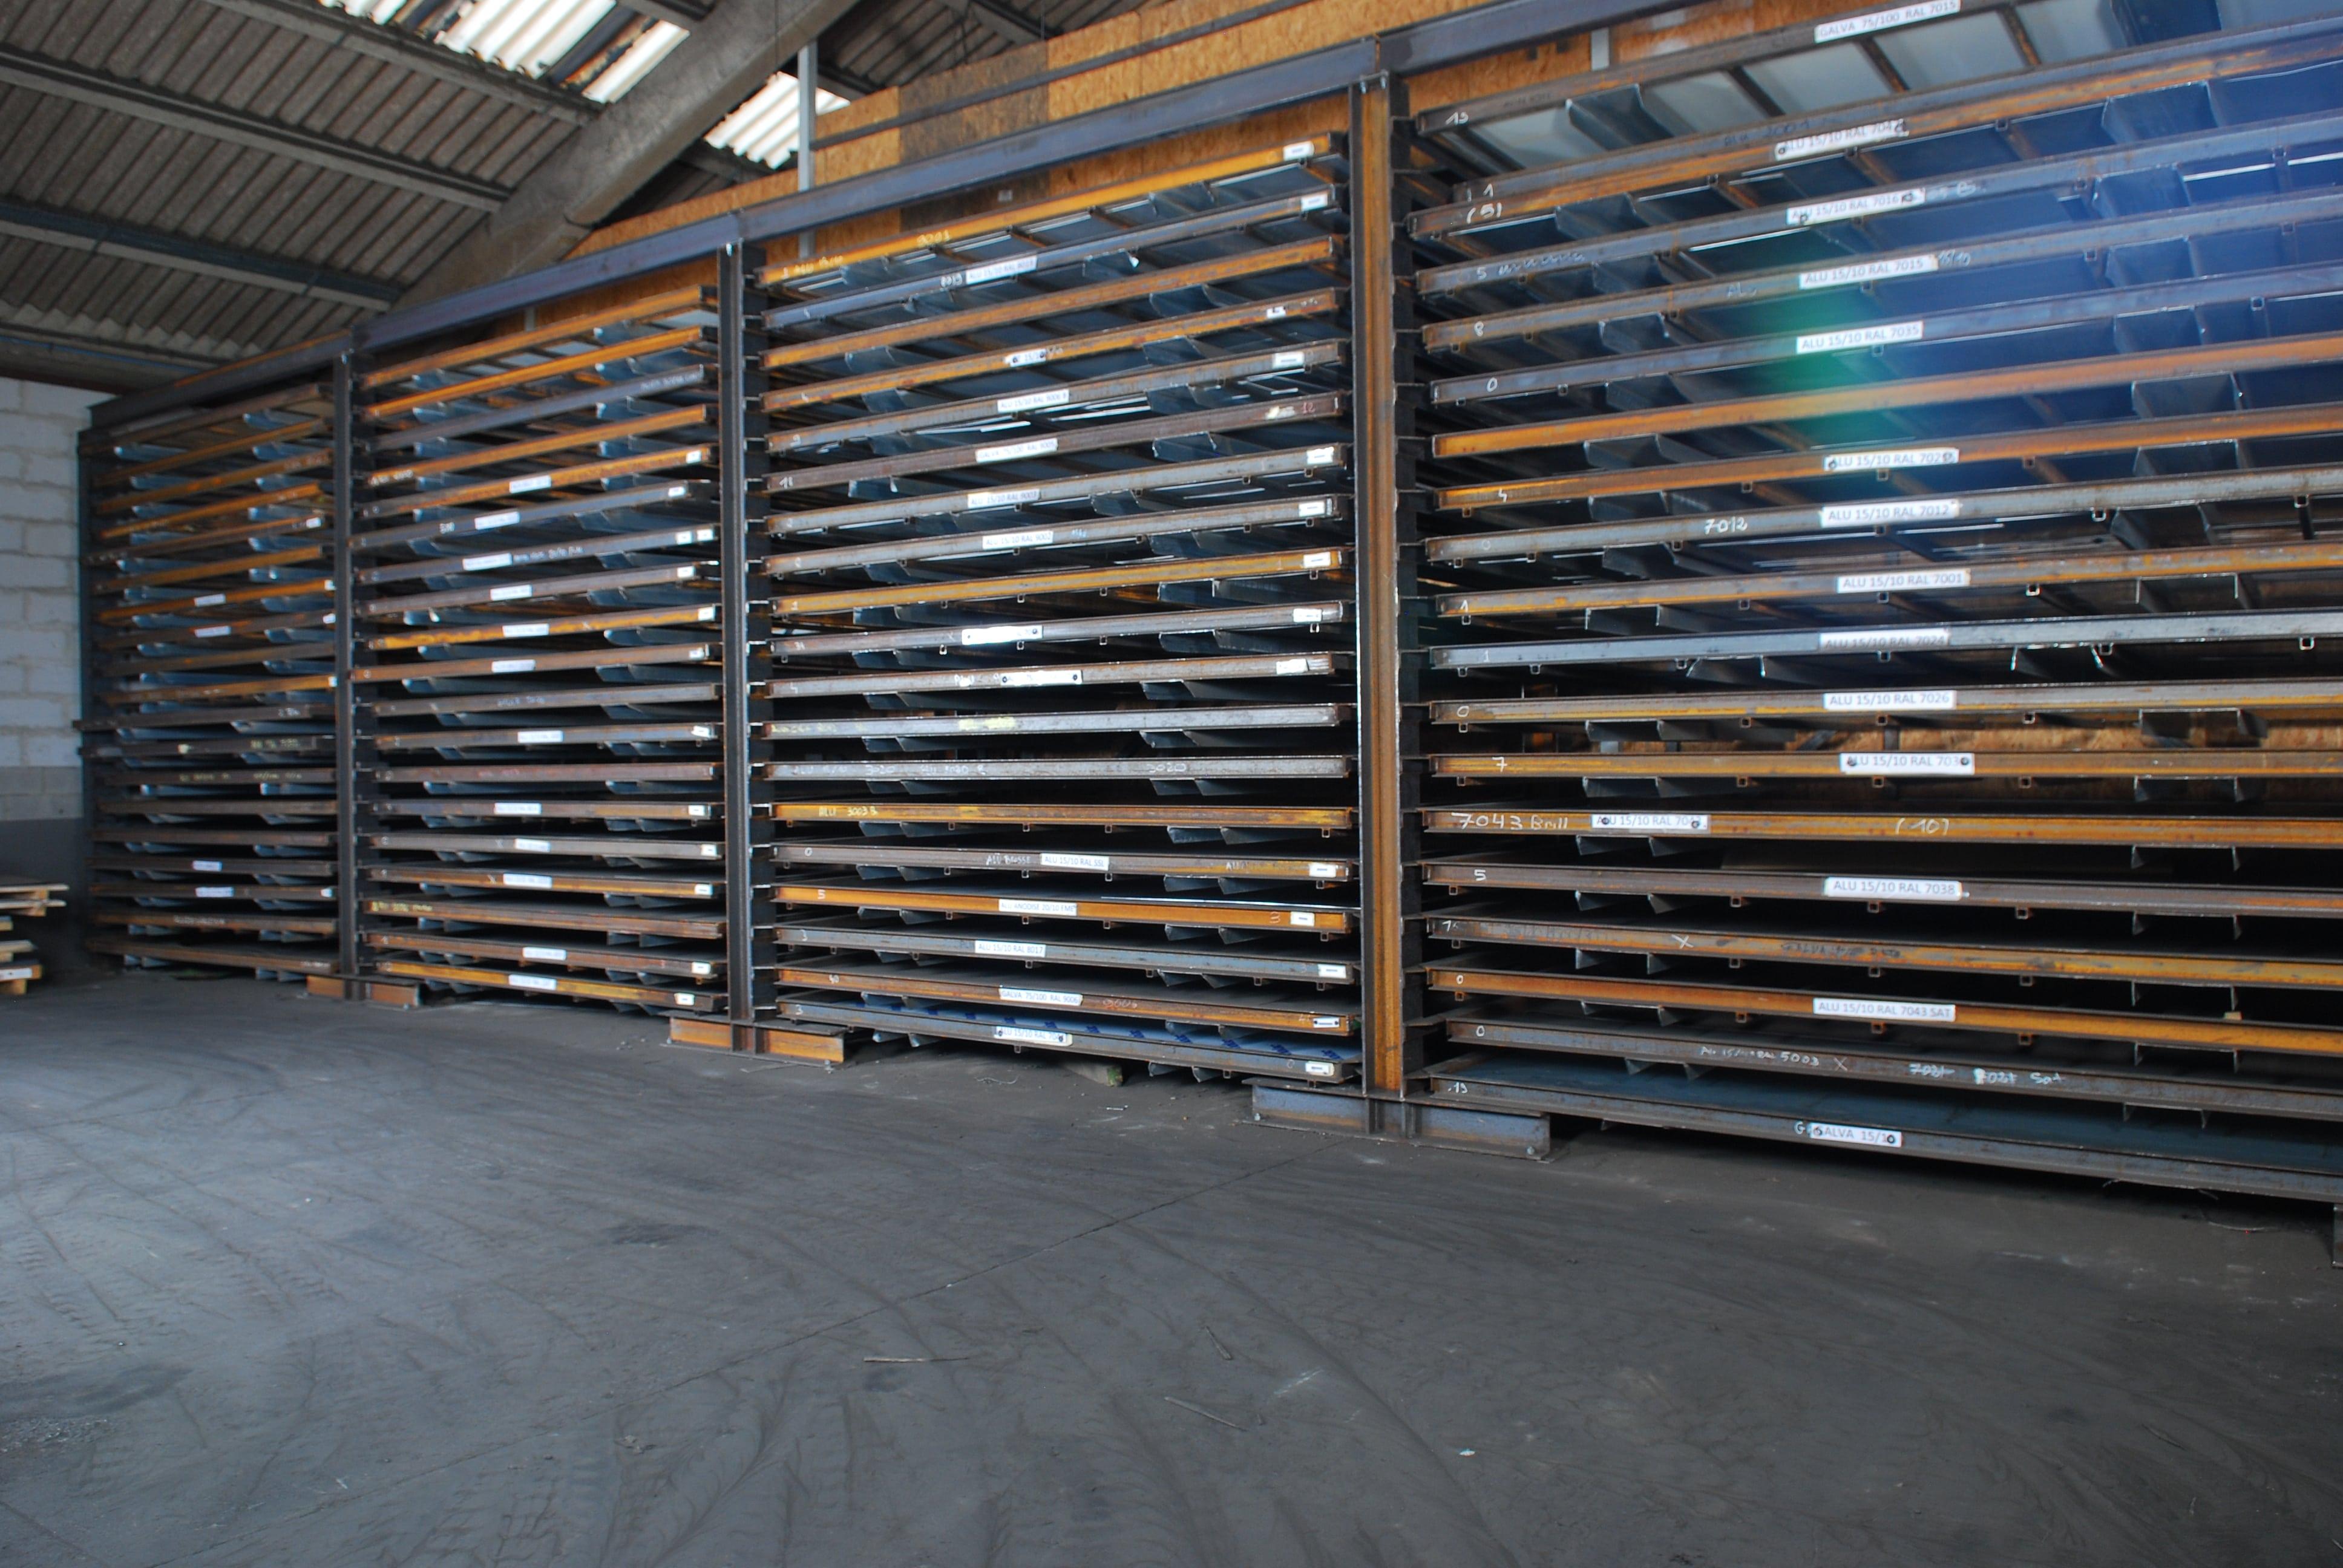 Systeme de stockage-15945-min